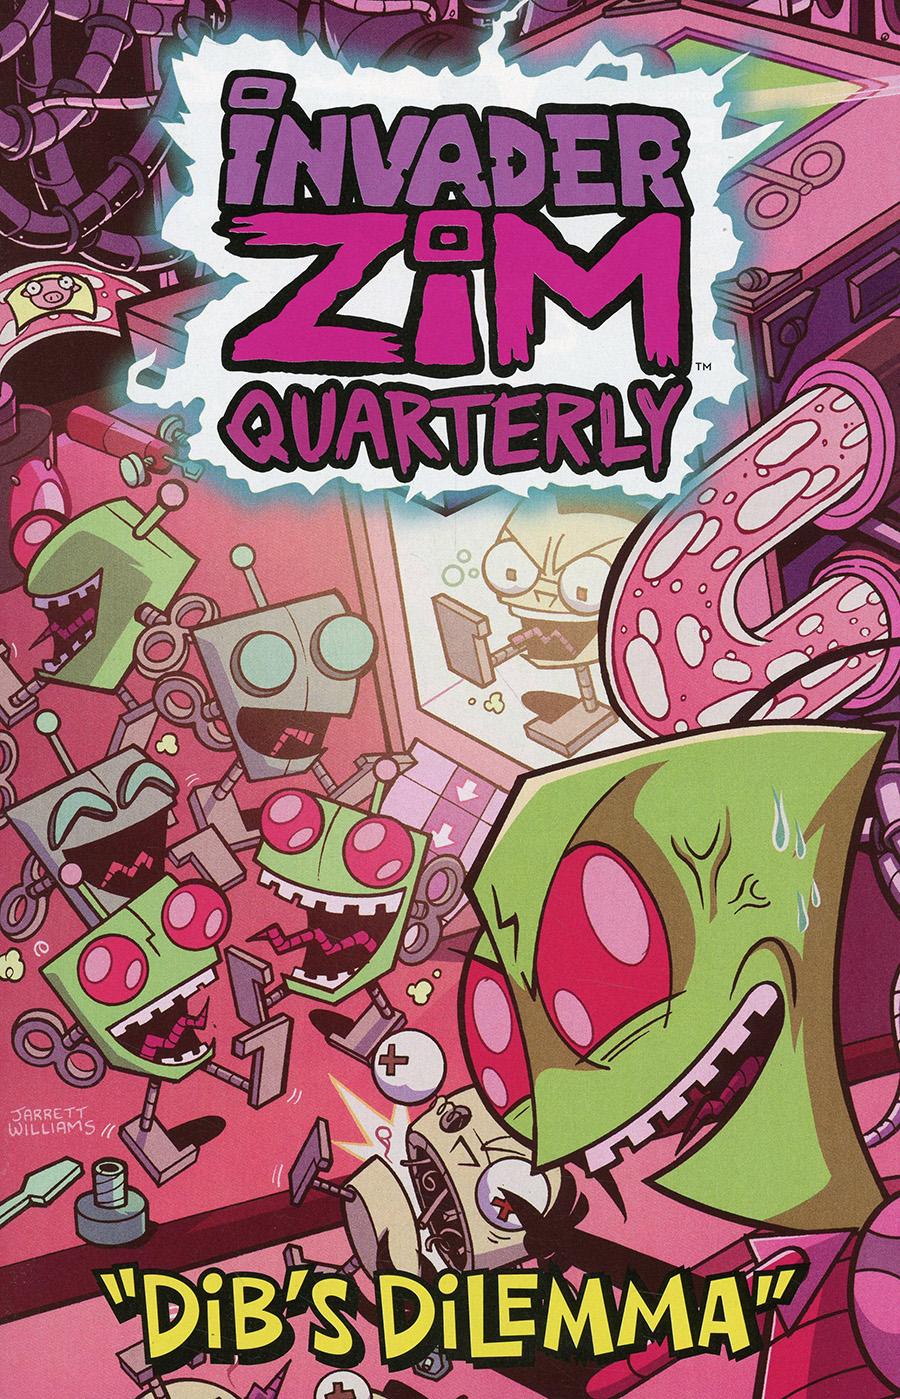 Invader Zim Quarterly #2 Dibs Dilemma Cover C Variant Jarrett Williams Cover